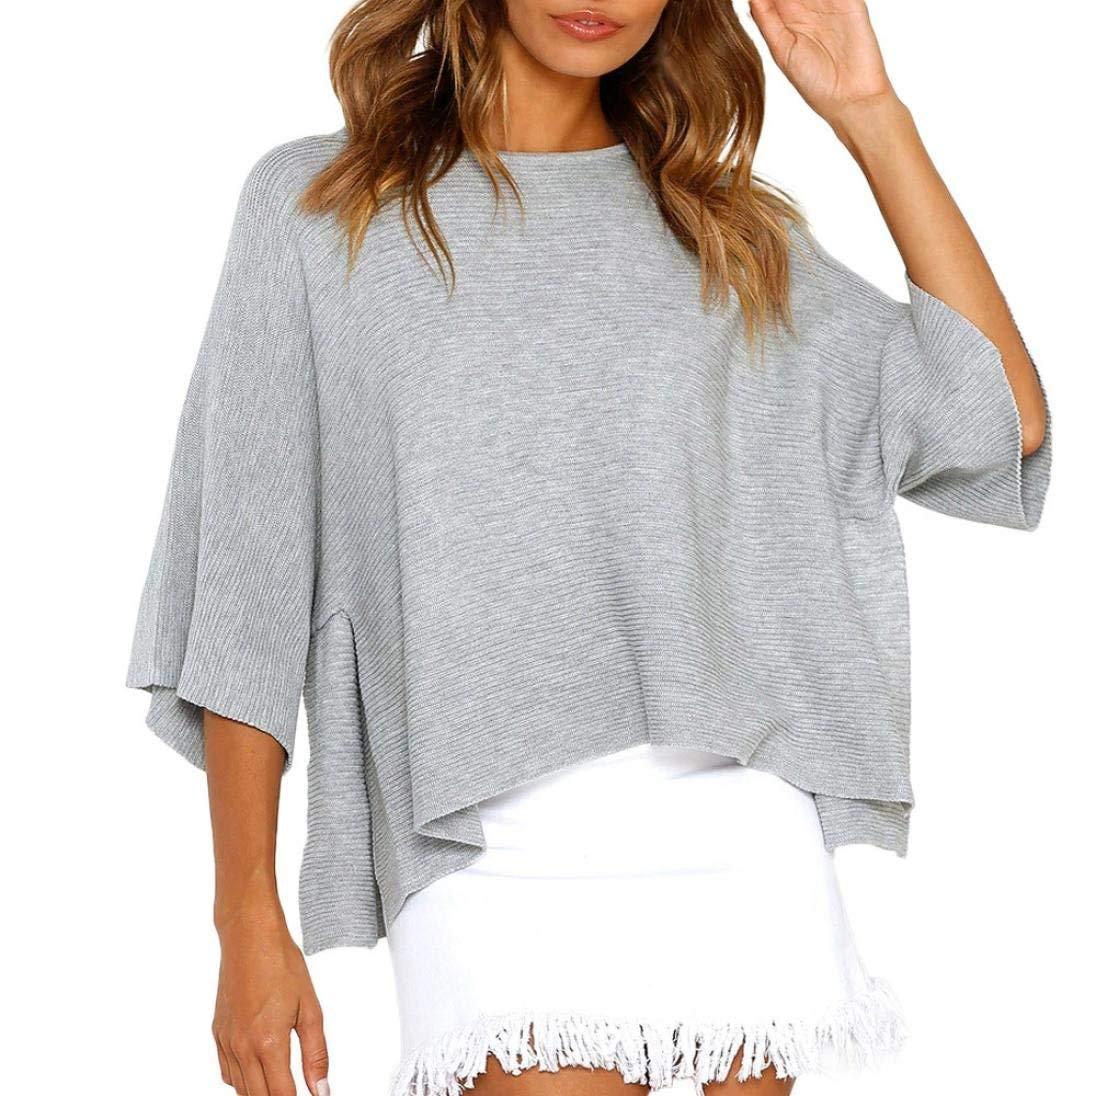 Franterd Women Shirt Ladies Autumn Irregular Hem Casual Tops Solid Pullover Batwing Sleeve, Knitting Stlye